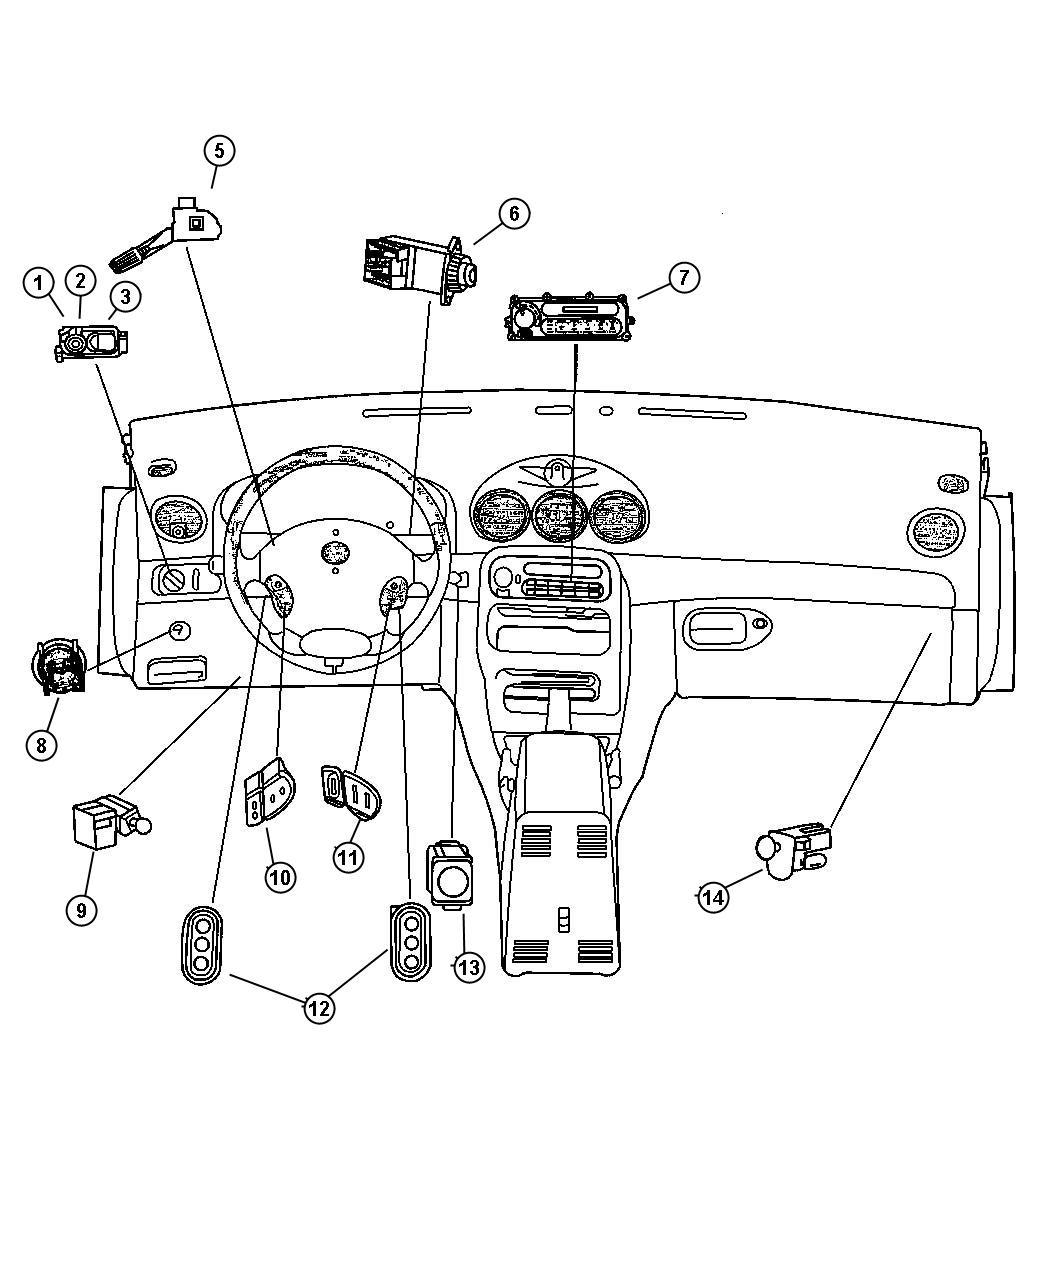 Dodge Intrepid Switch. Headlamp. Headlamps, automatic, fog